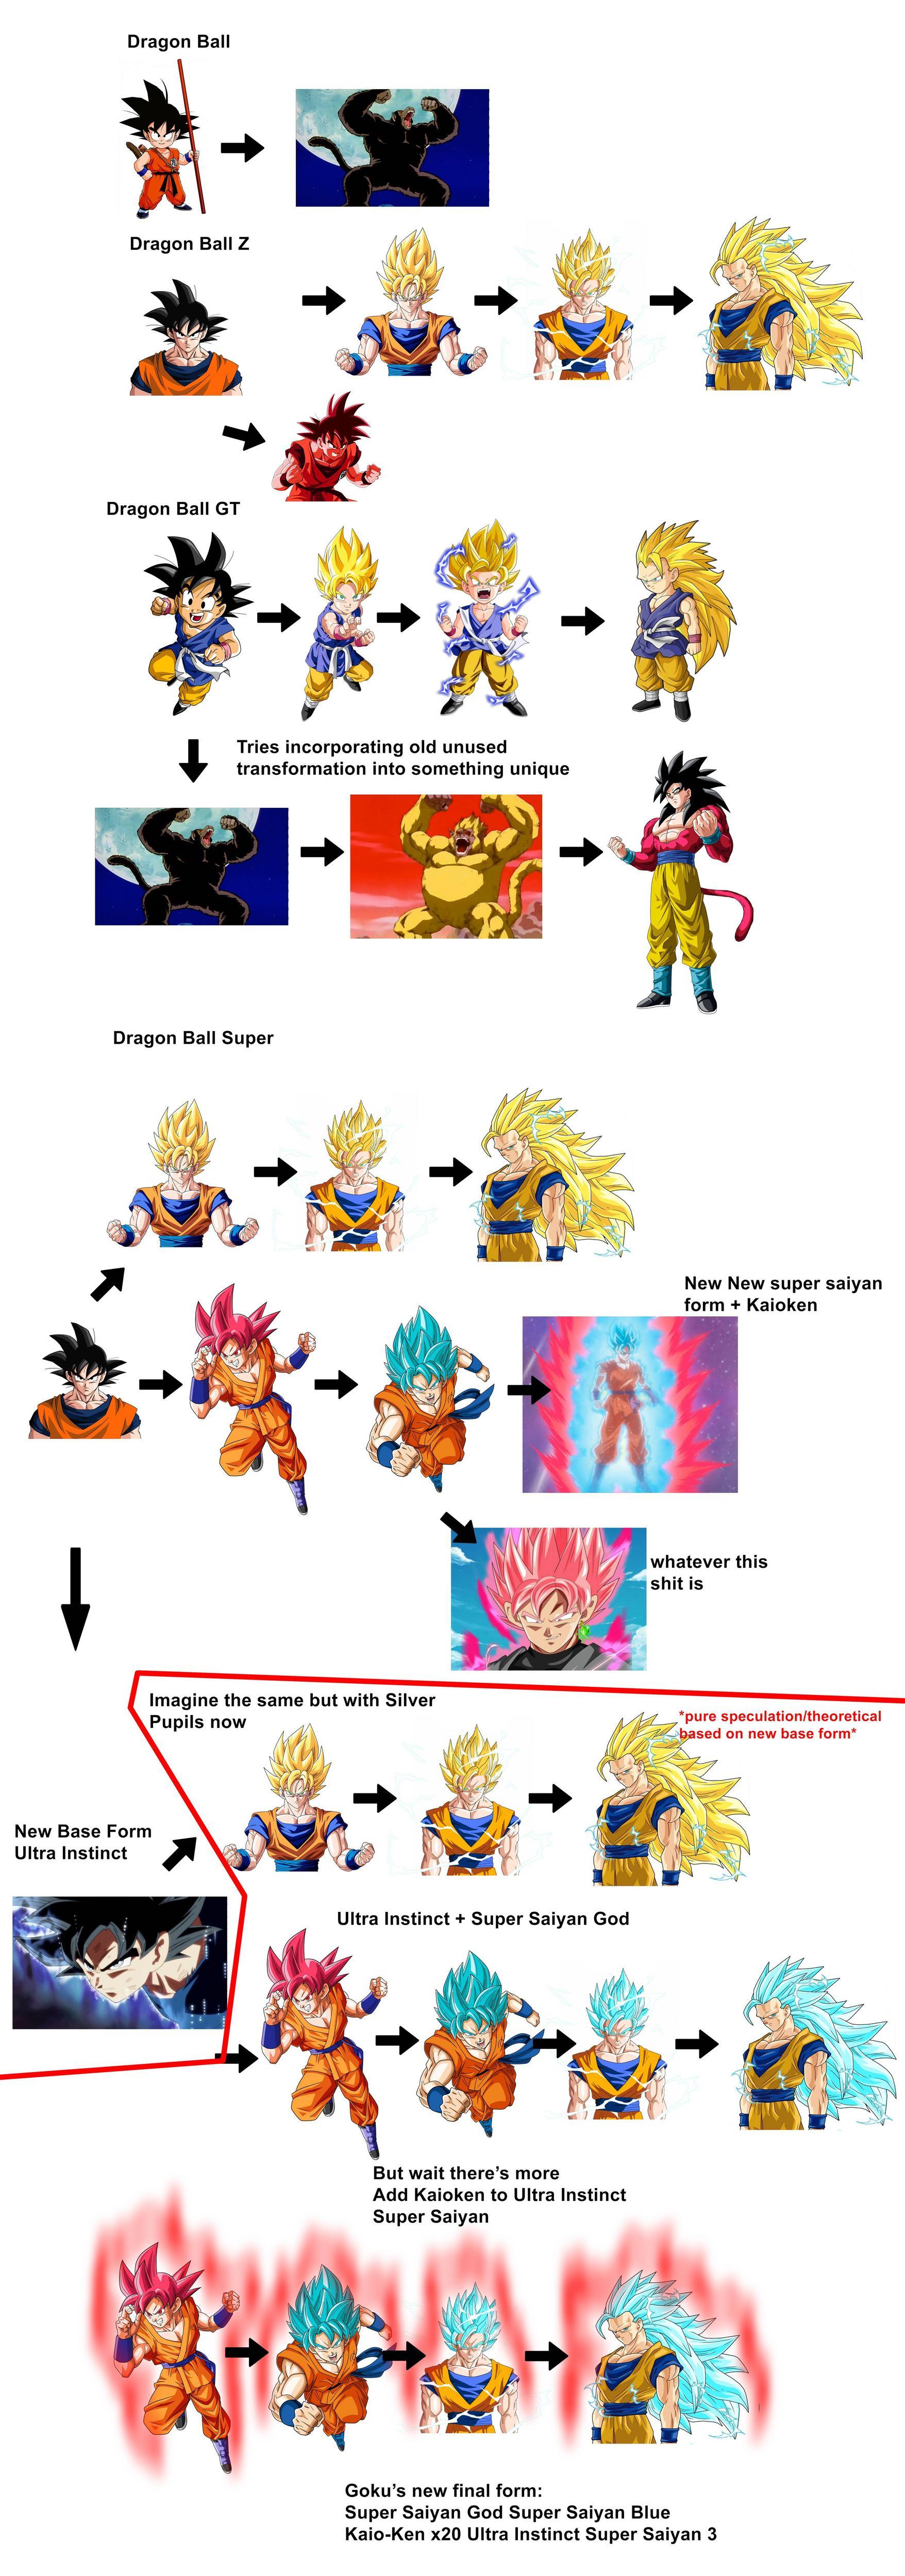 Dragon Ball Super Transformations Ruin The Dragon Ball Series